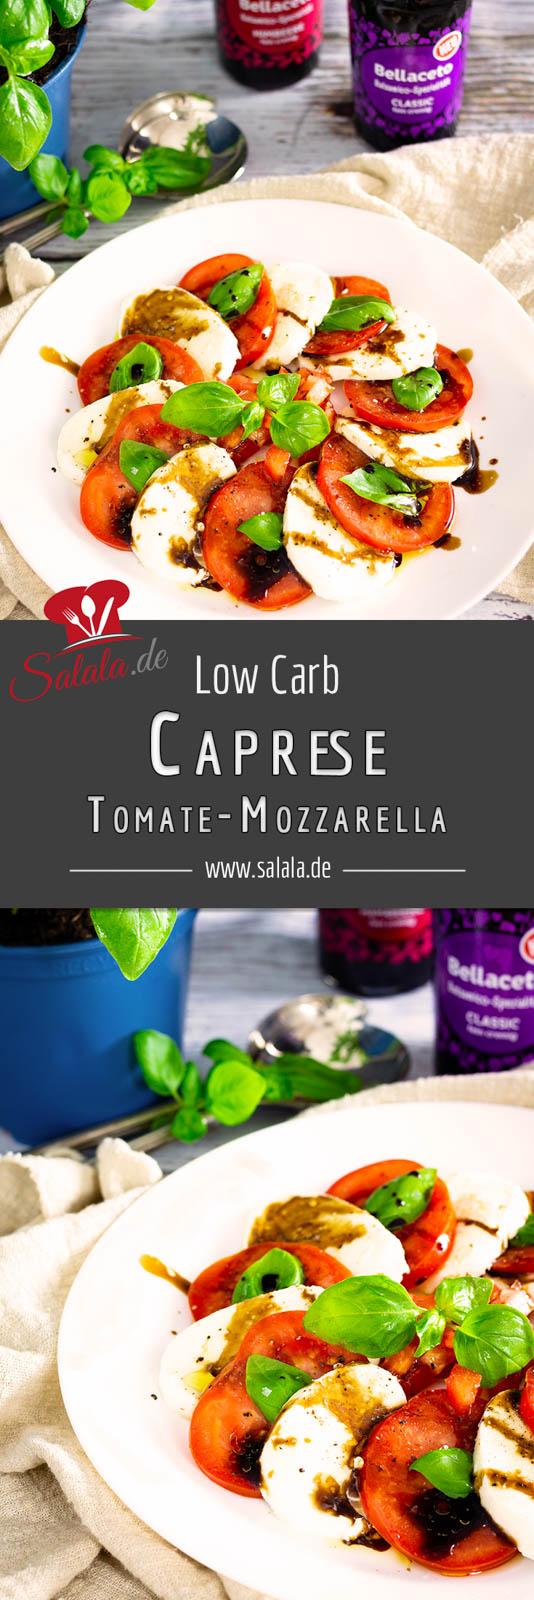 #KuehneBellaceto #AllYouNeedIsBellaceto #caprese #tomatemozzarella #lowcarbsalat #salatmitmozzarella